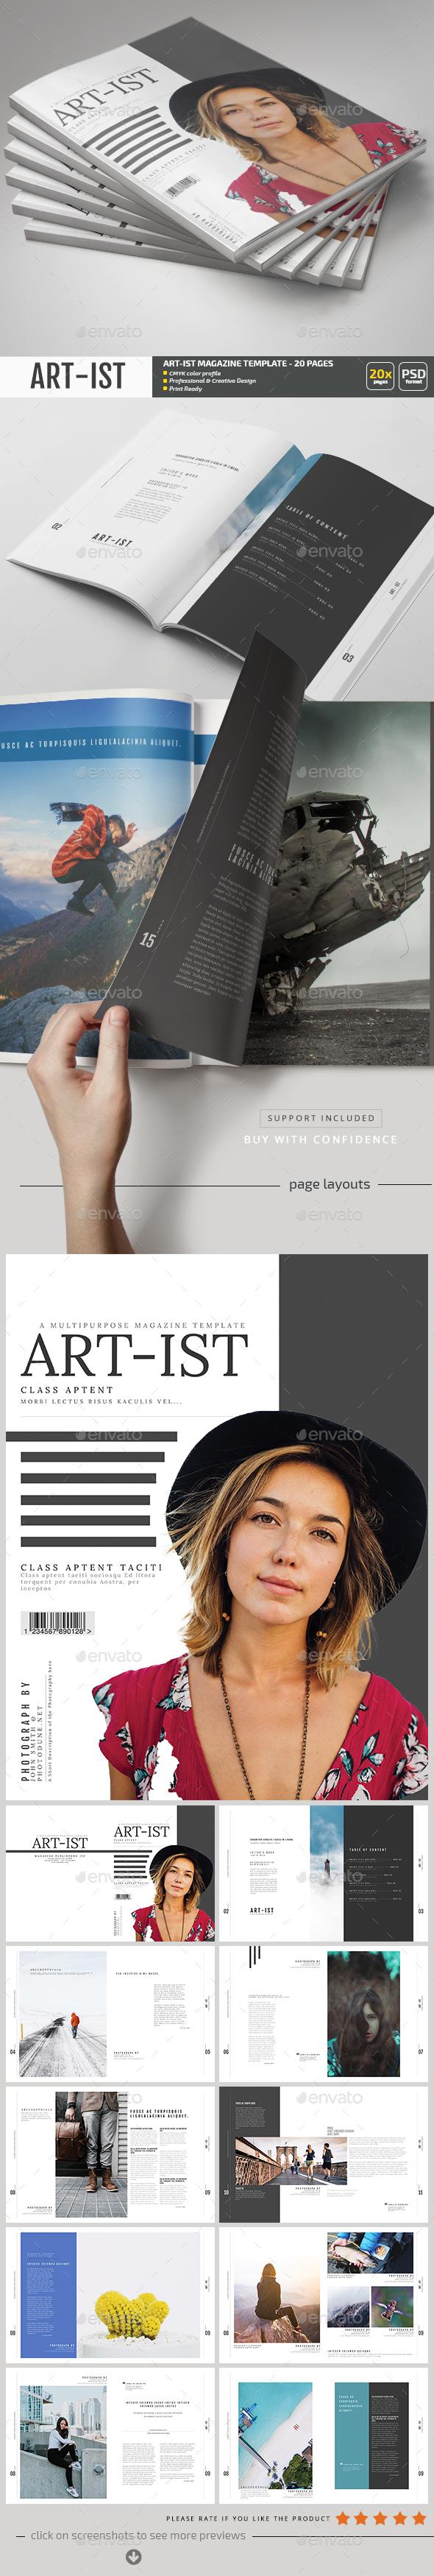 Art-ist Magazine Template V.18 - Magazines Print Templates